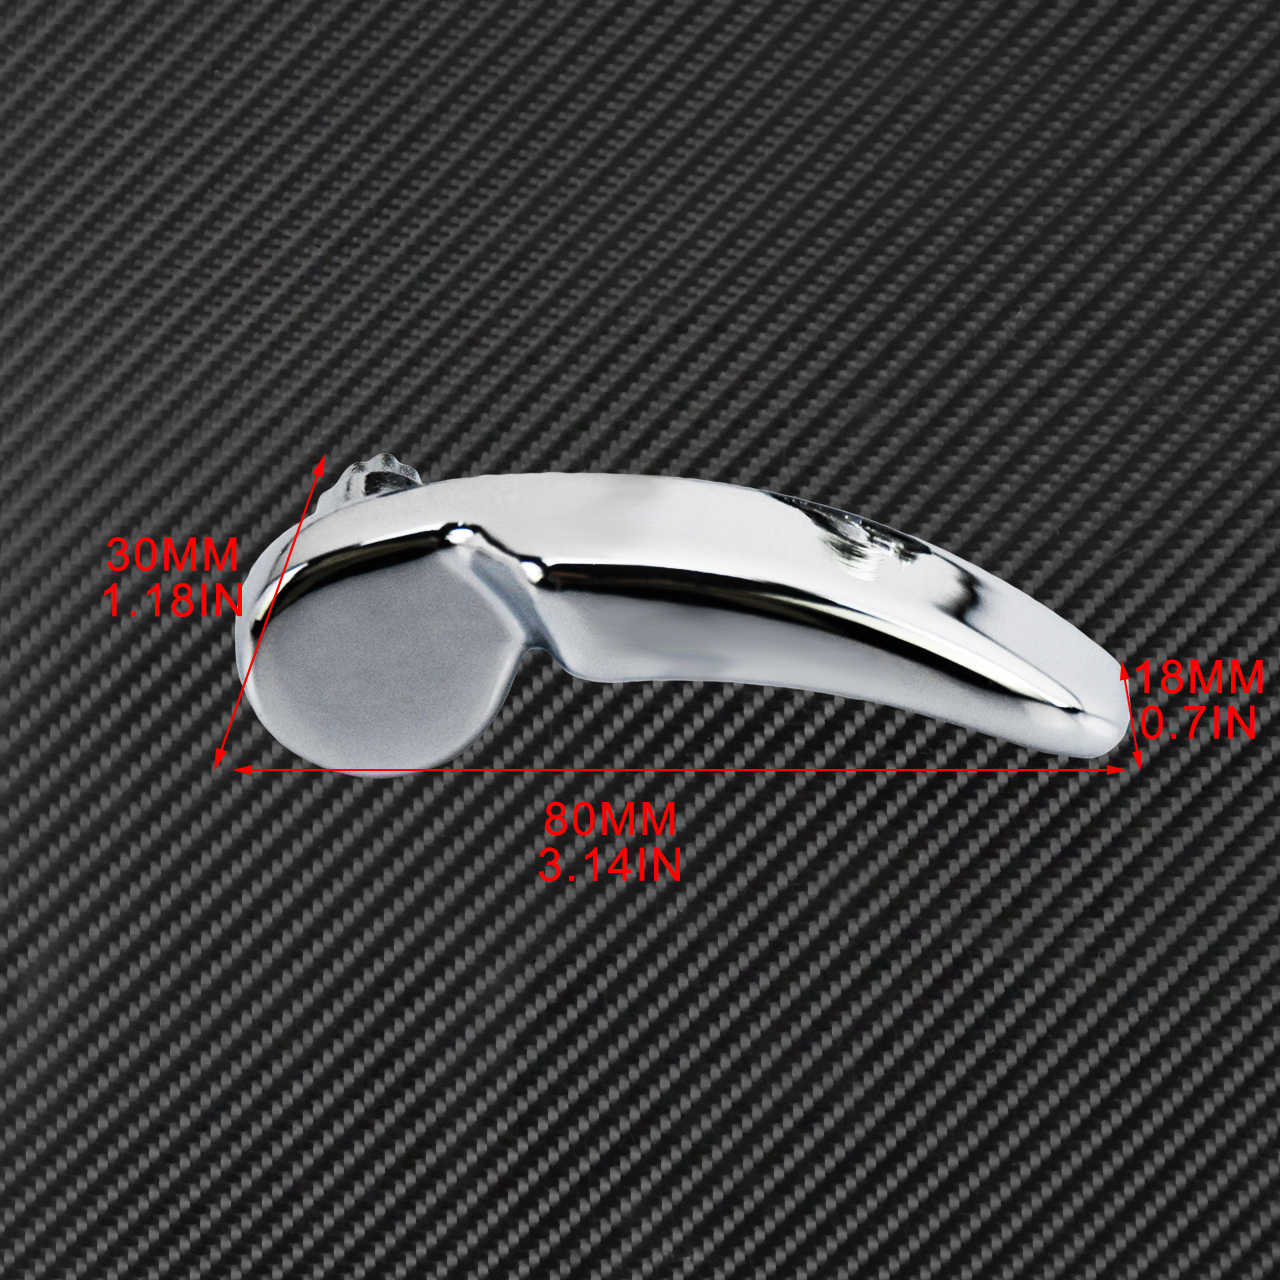 2 X Motor Pelana Tutup Lifter Aluminium Hitam/Chrome untuk Harley Touring Electra Glide Jalan Street Glide Jalan Raja 2014-2019